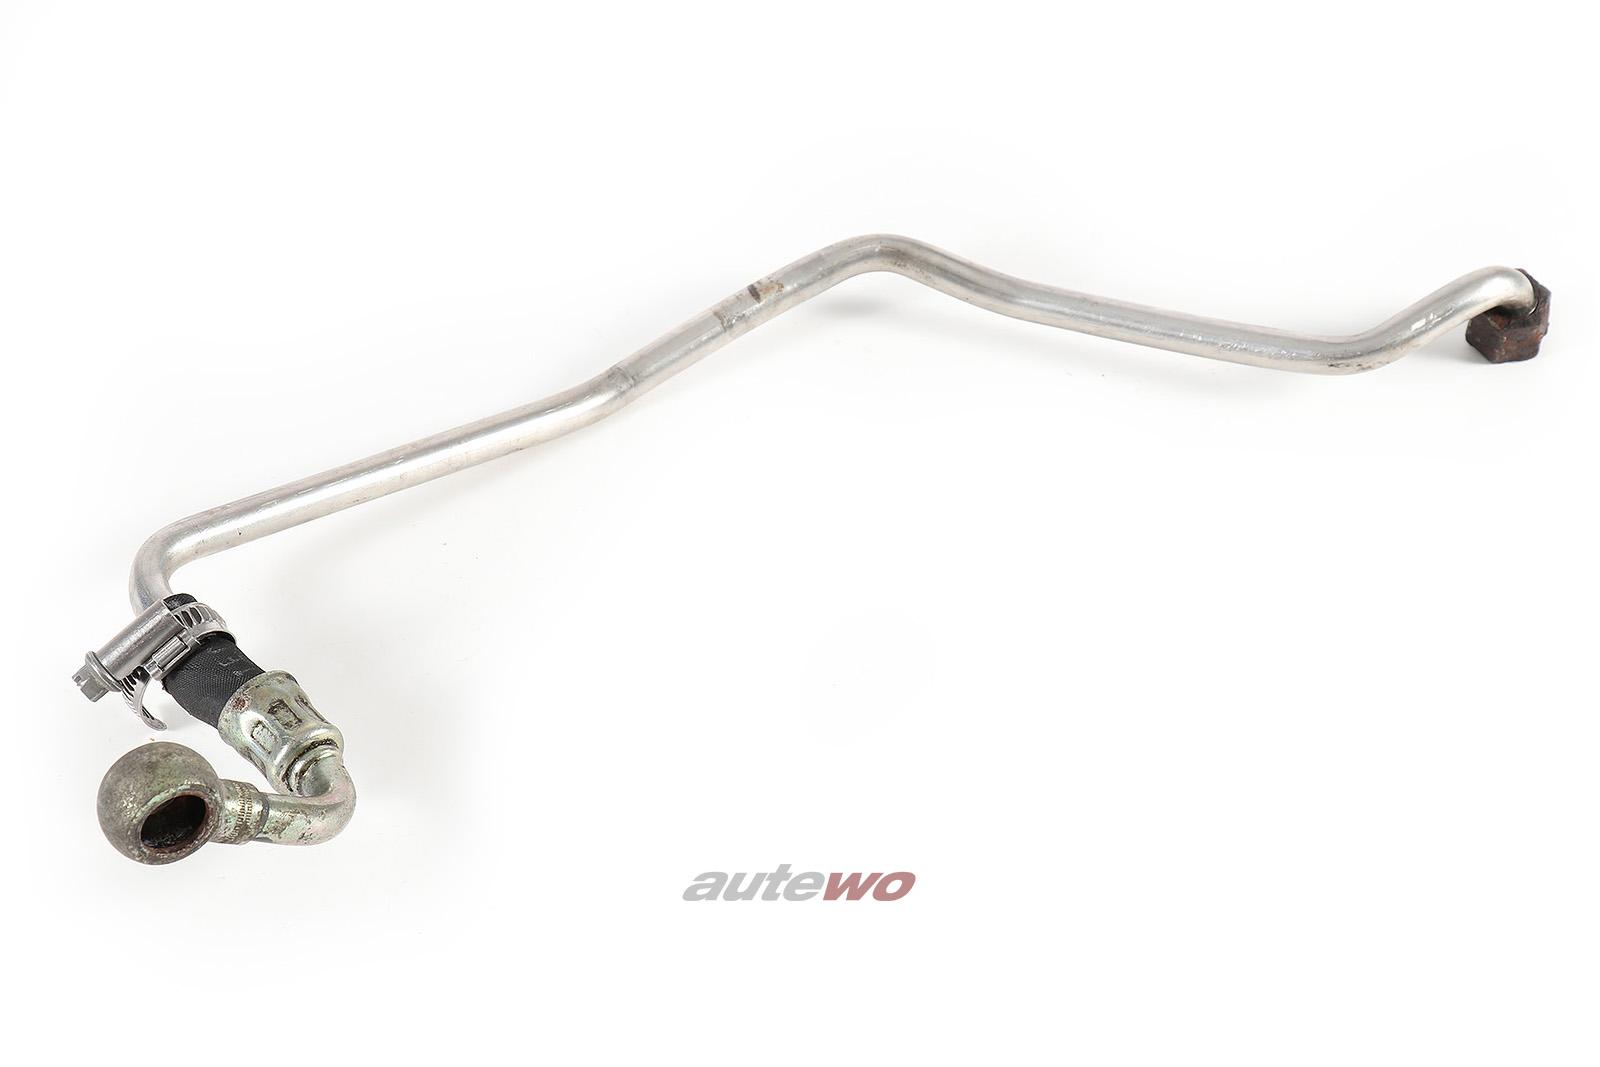 035121498C Audi 100/200 Typ 44/Urquattro 10V Kühlmittelrohr Rücklauf Turbo